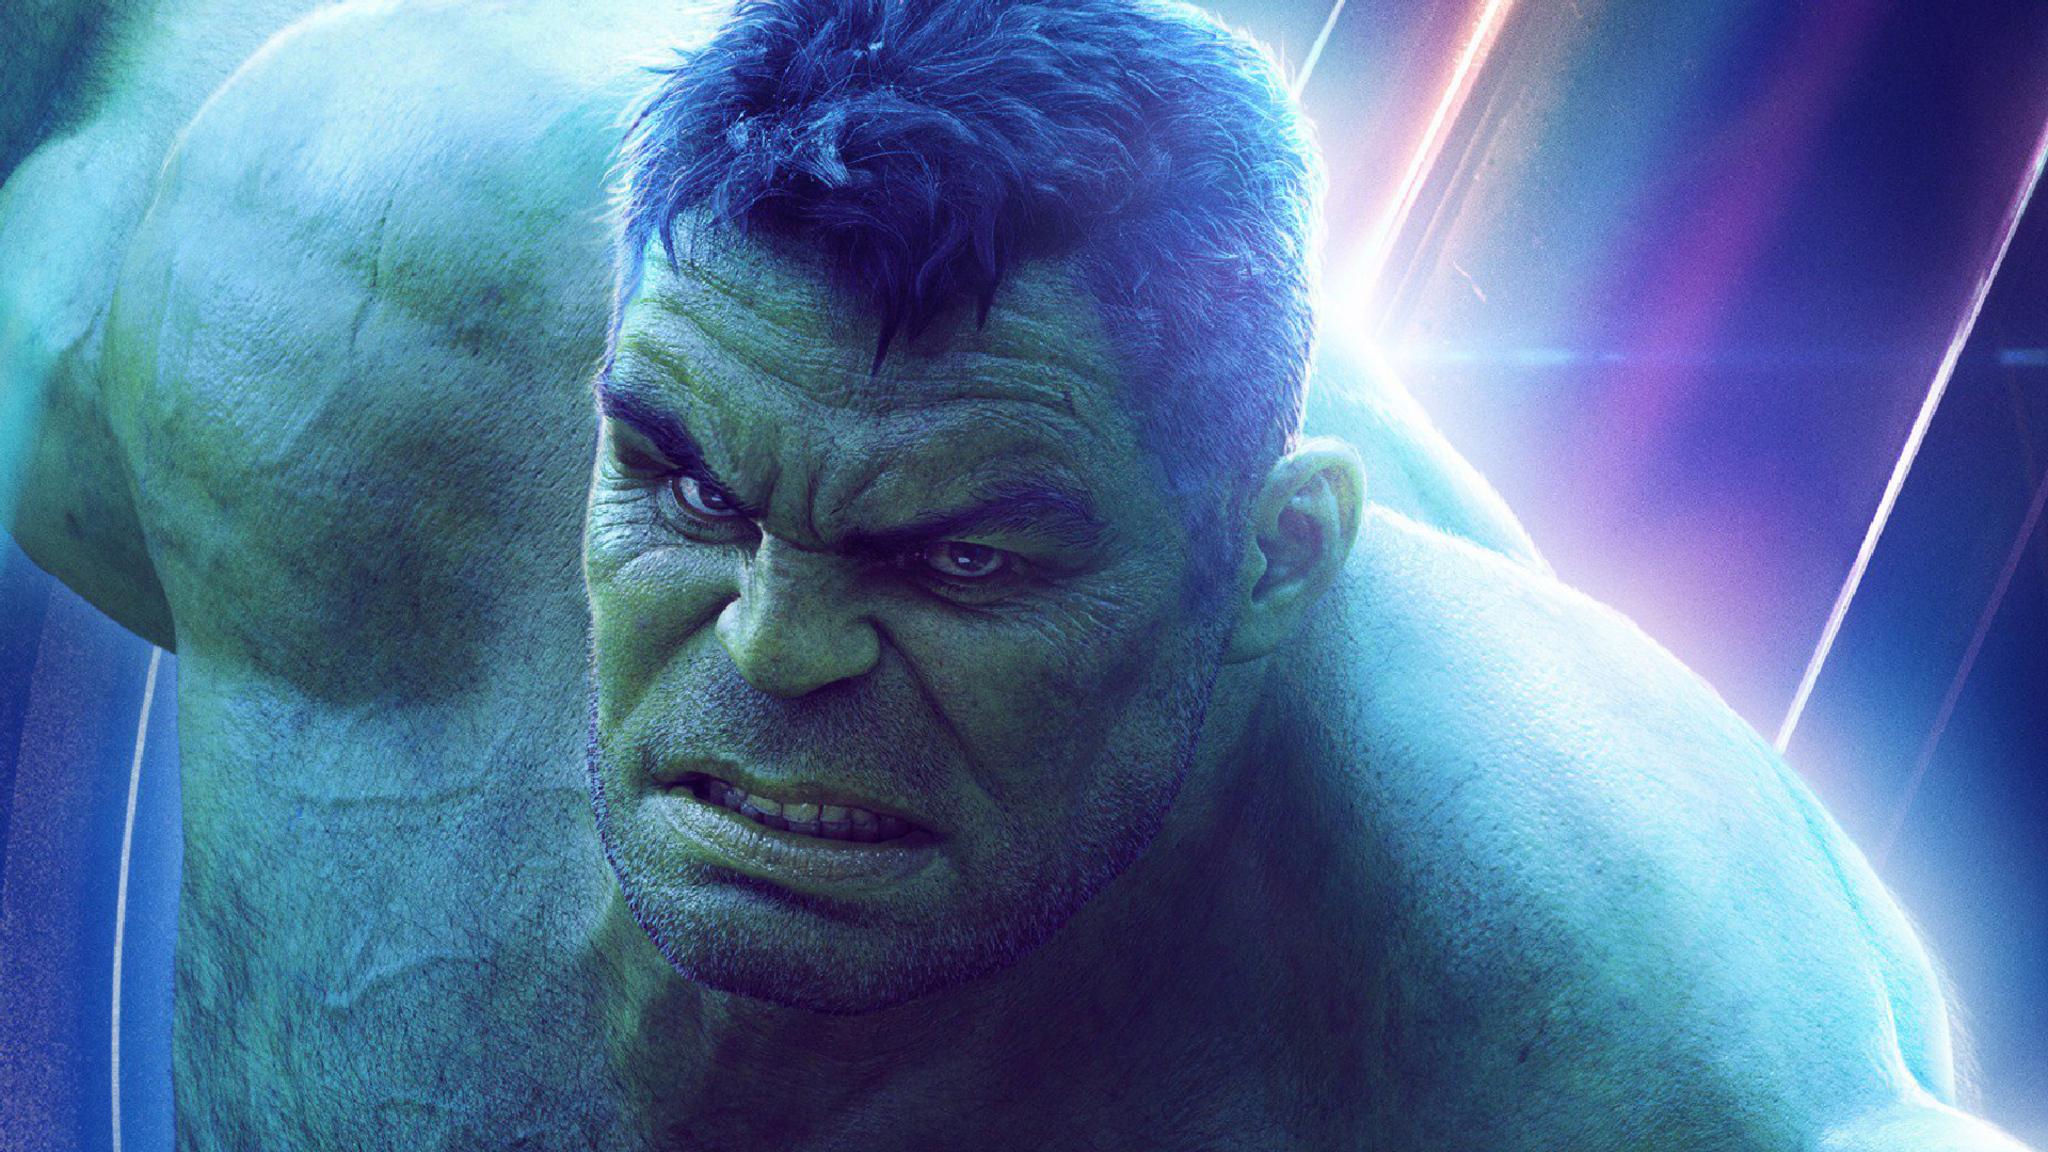 Shuri In Avengers Infinity War New Poster Hd Movies 4k: 2048x1152 Hulk In Avengers Infinity War New Poster